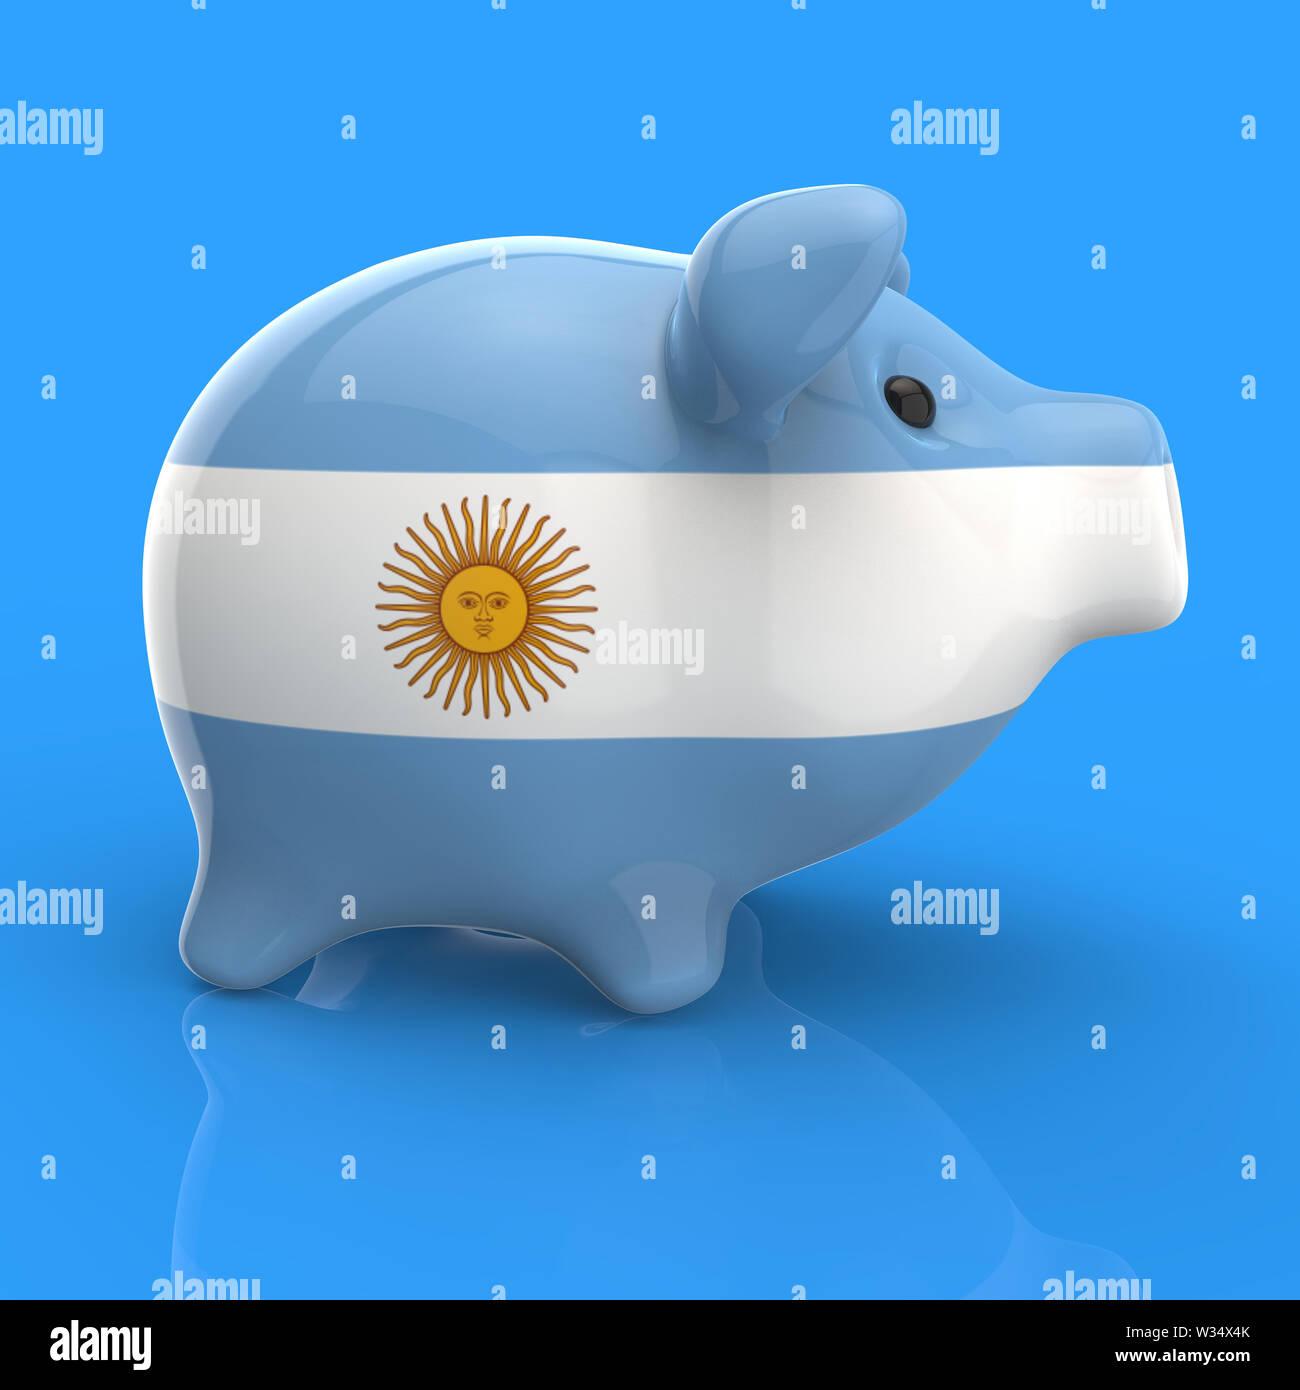 Piggy bank - 3D Illustration - Stock Image